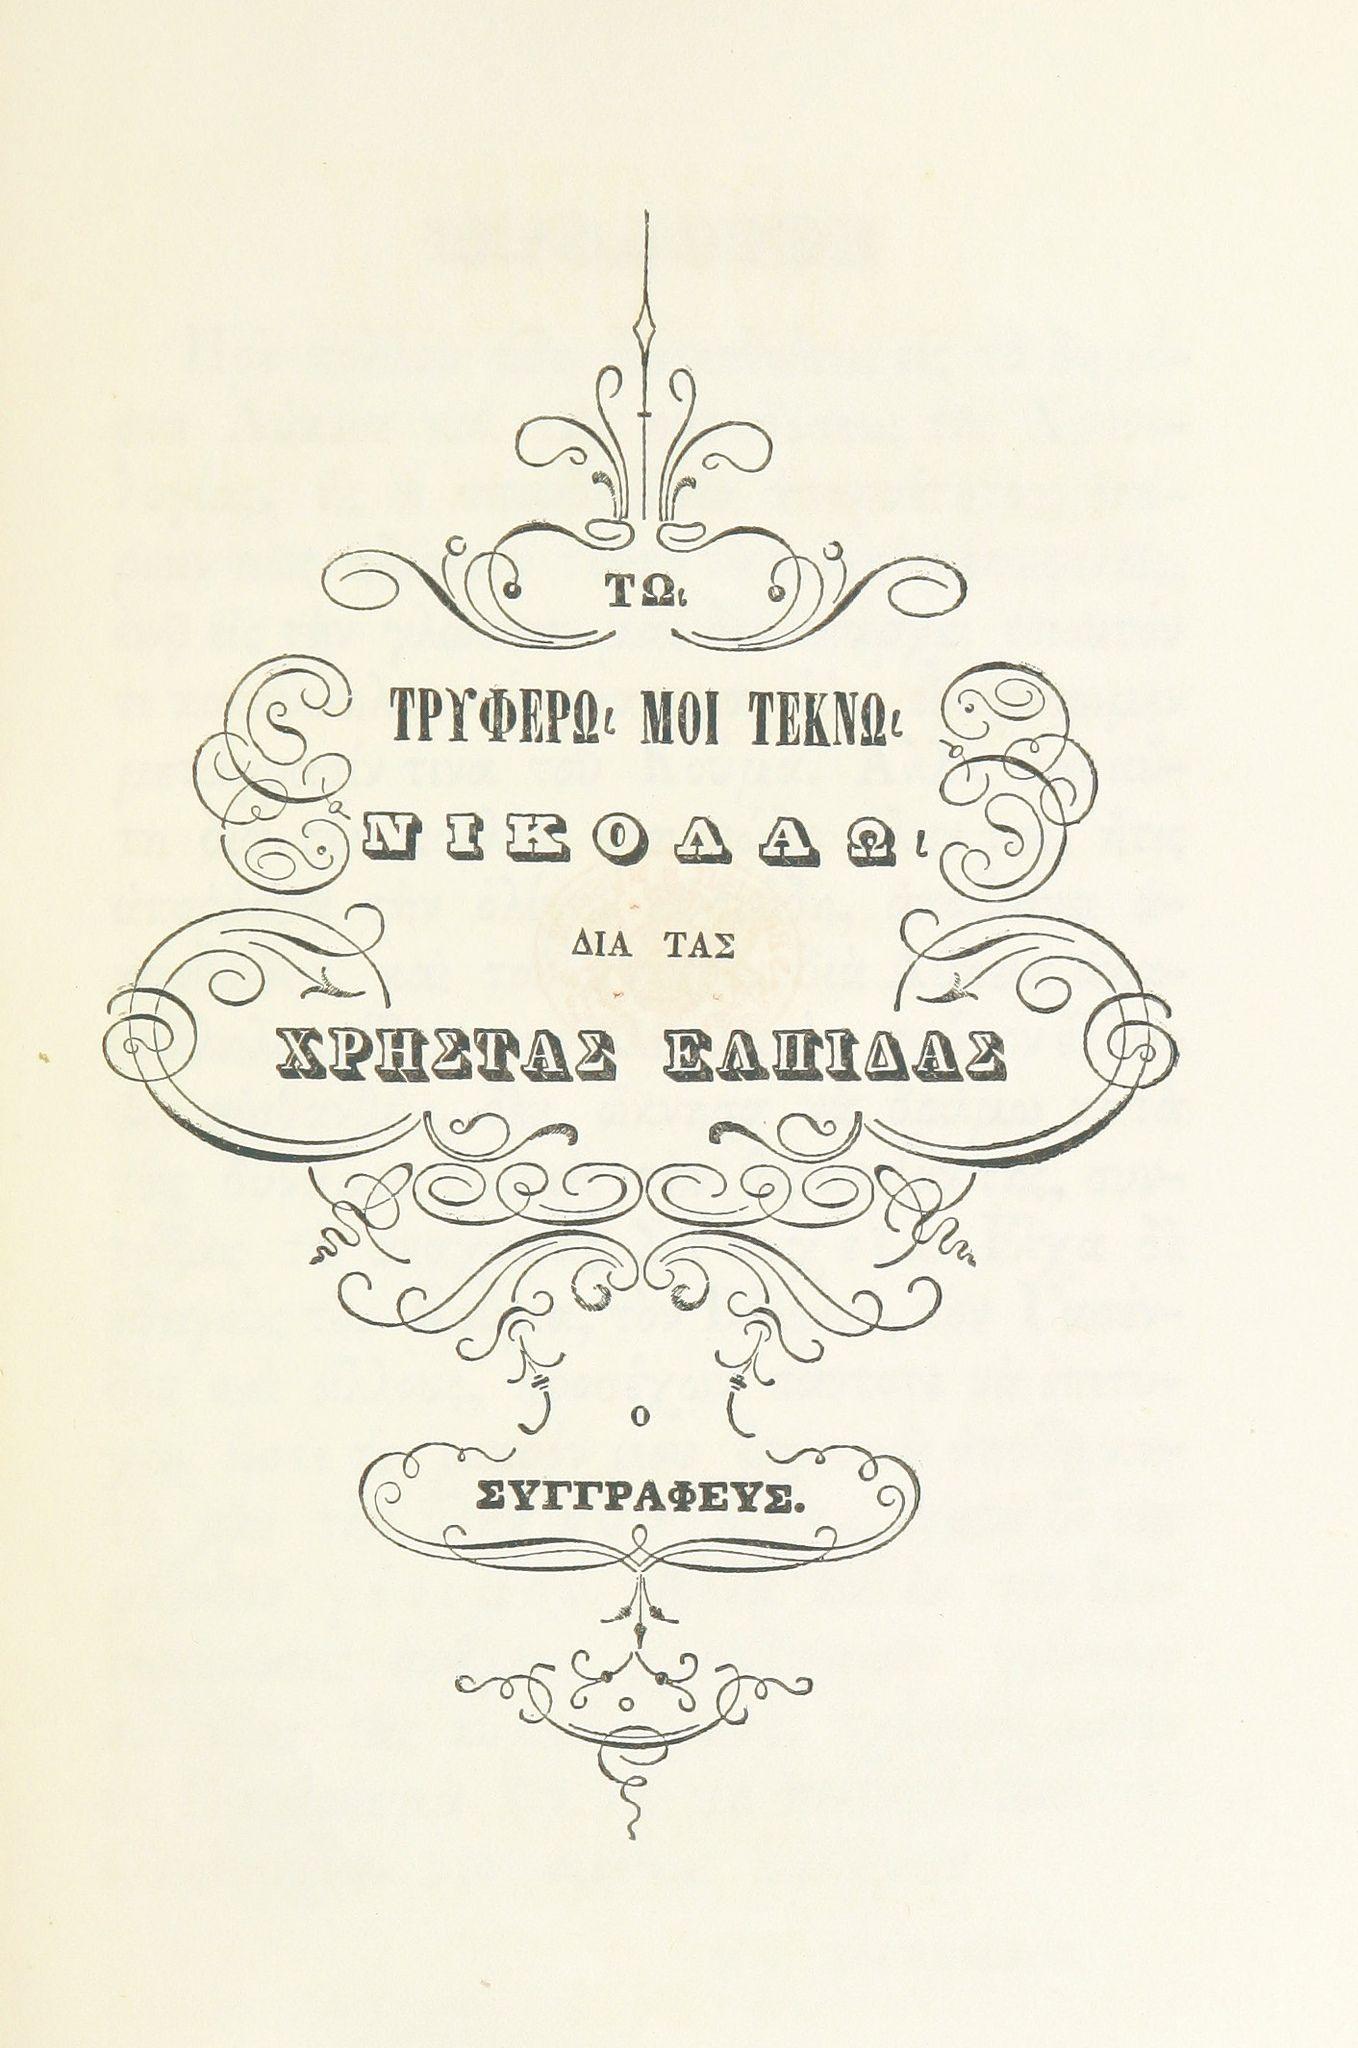 Image taken from page 9 of \'Χρονολογια μαθηματικη και ἱστορικη ...